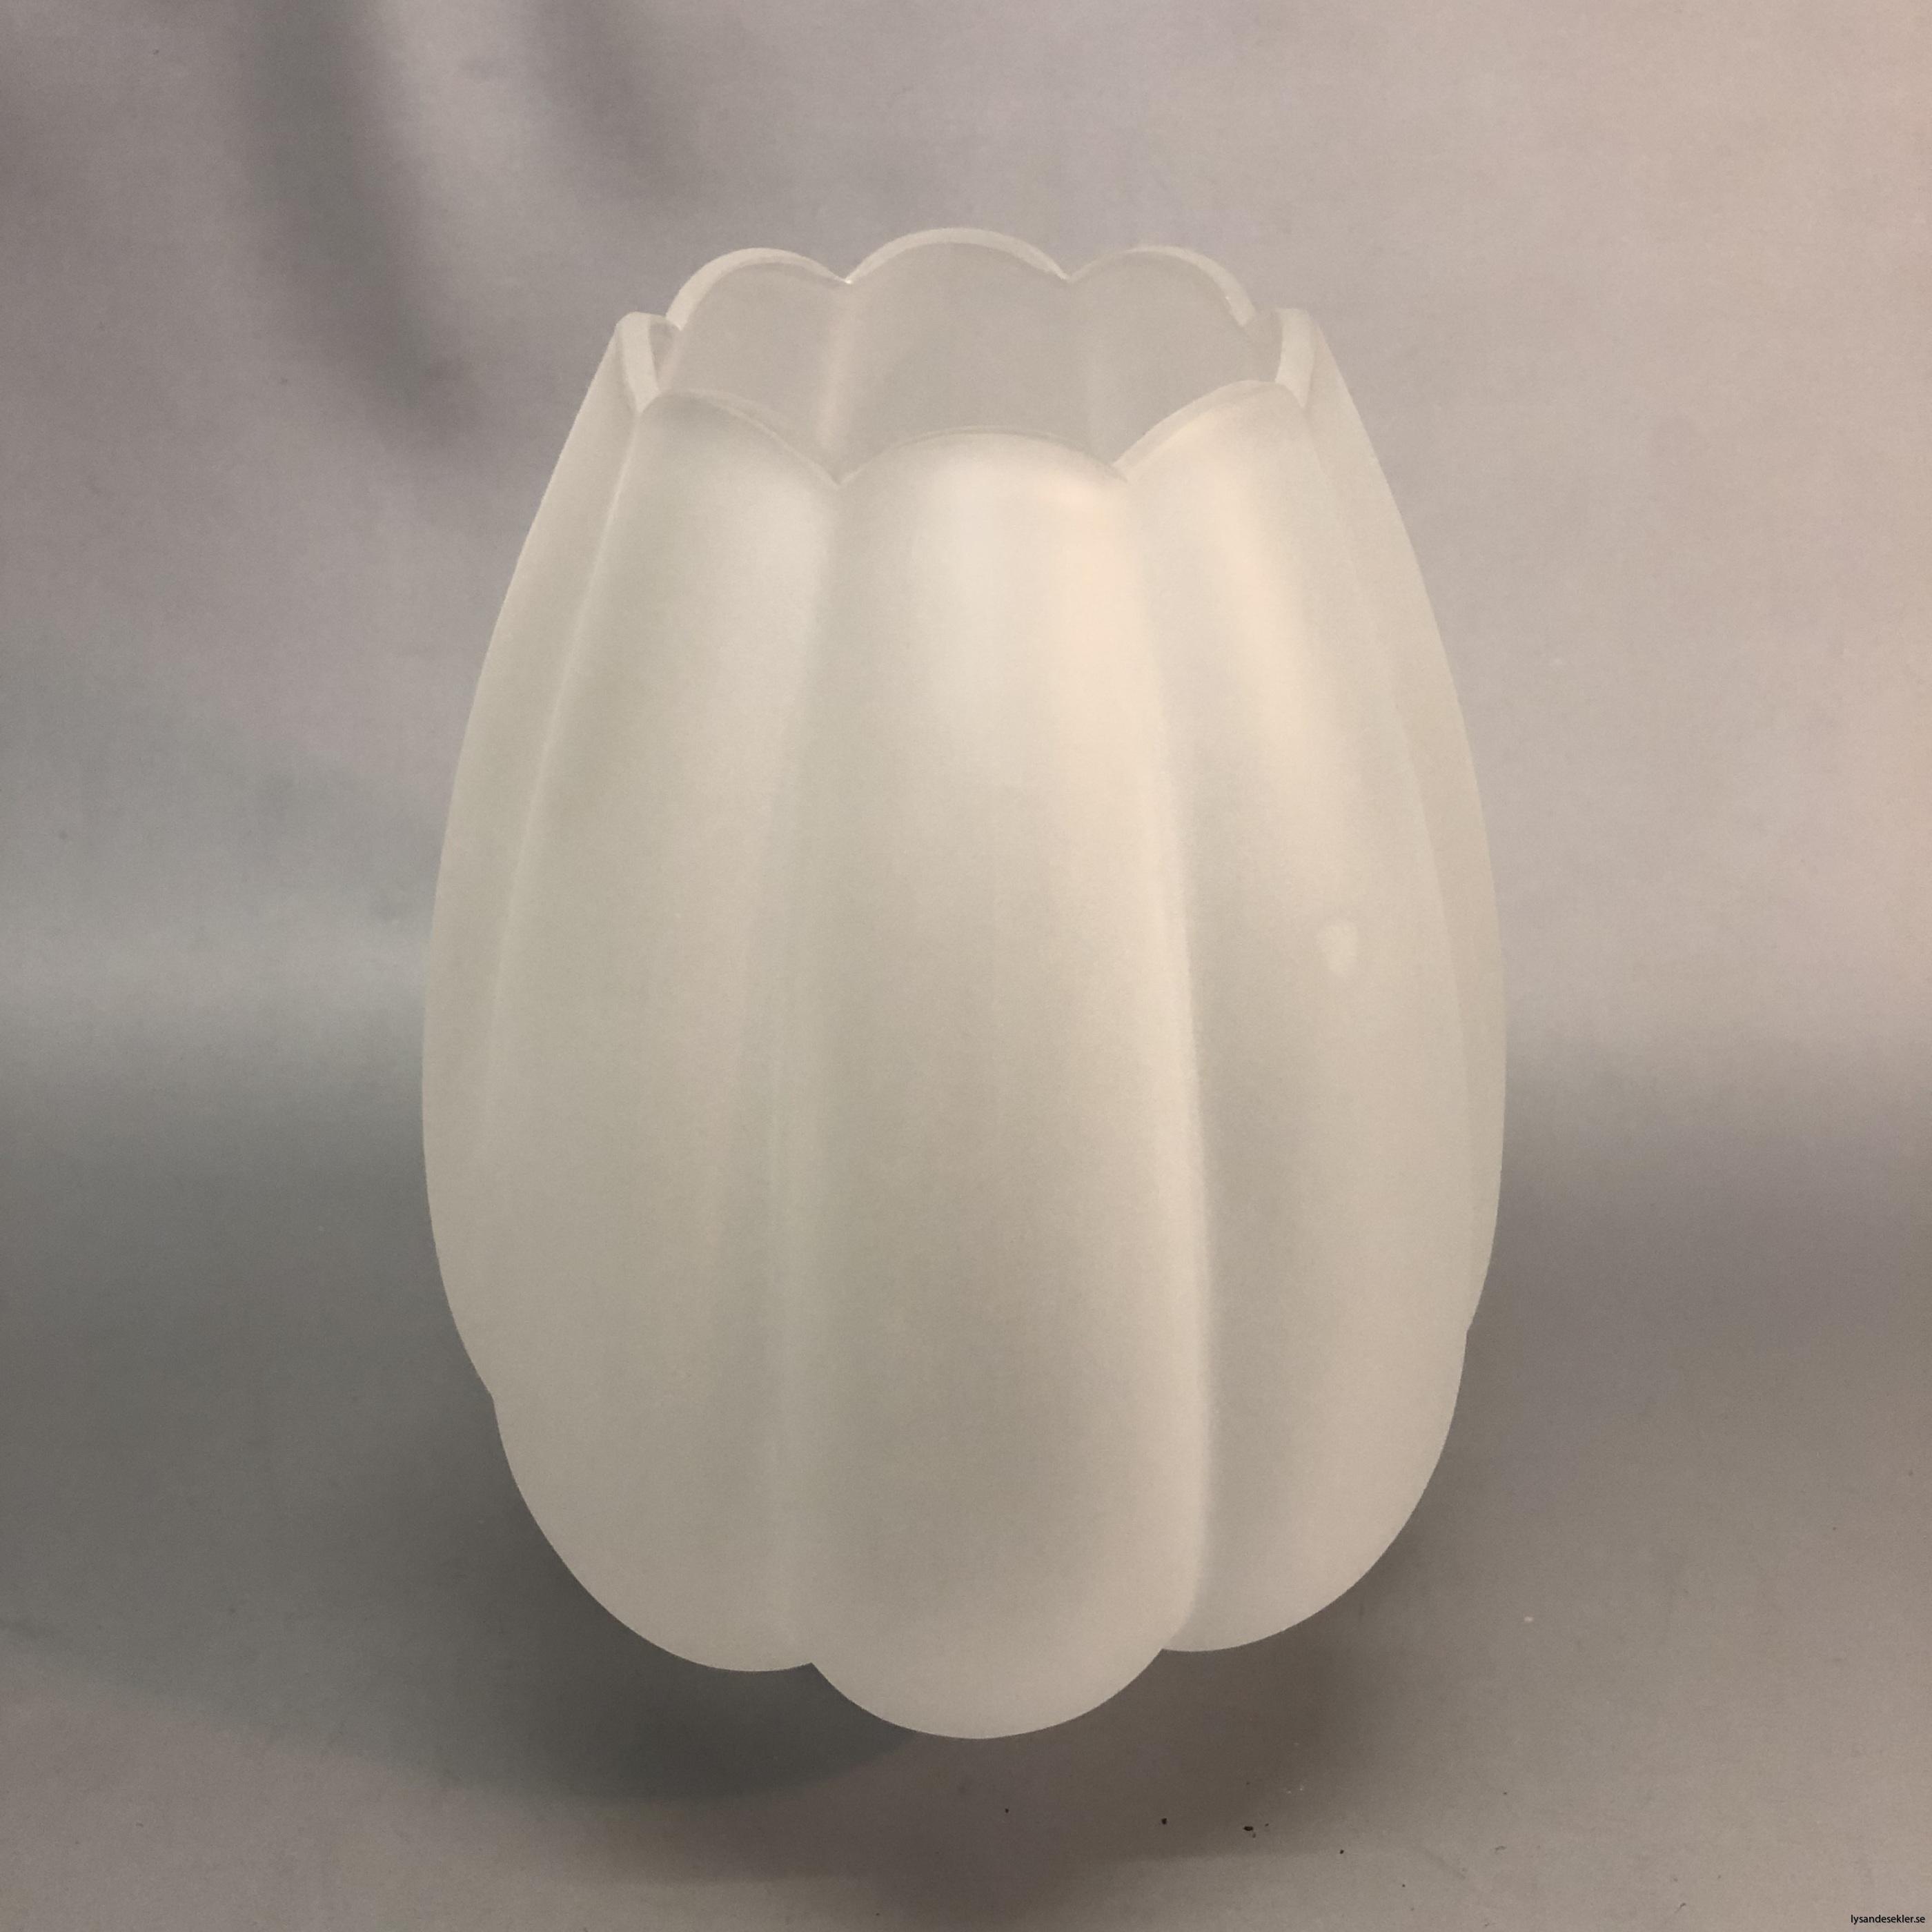 fotogenlampskupa kupa till fotogenlampa tulipan tulpan tulpankupor kupor20